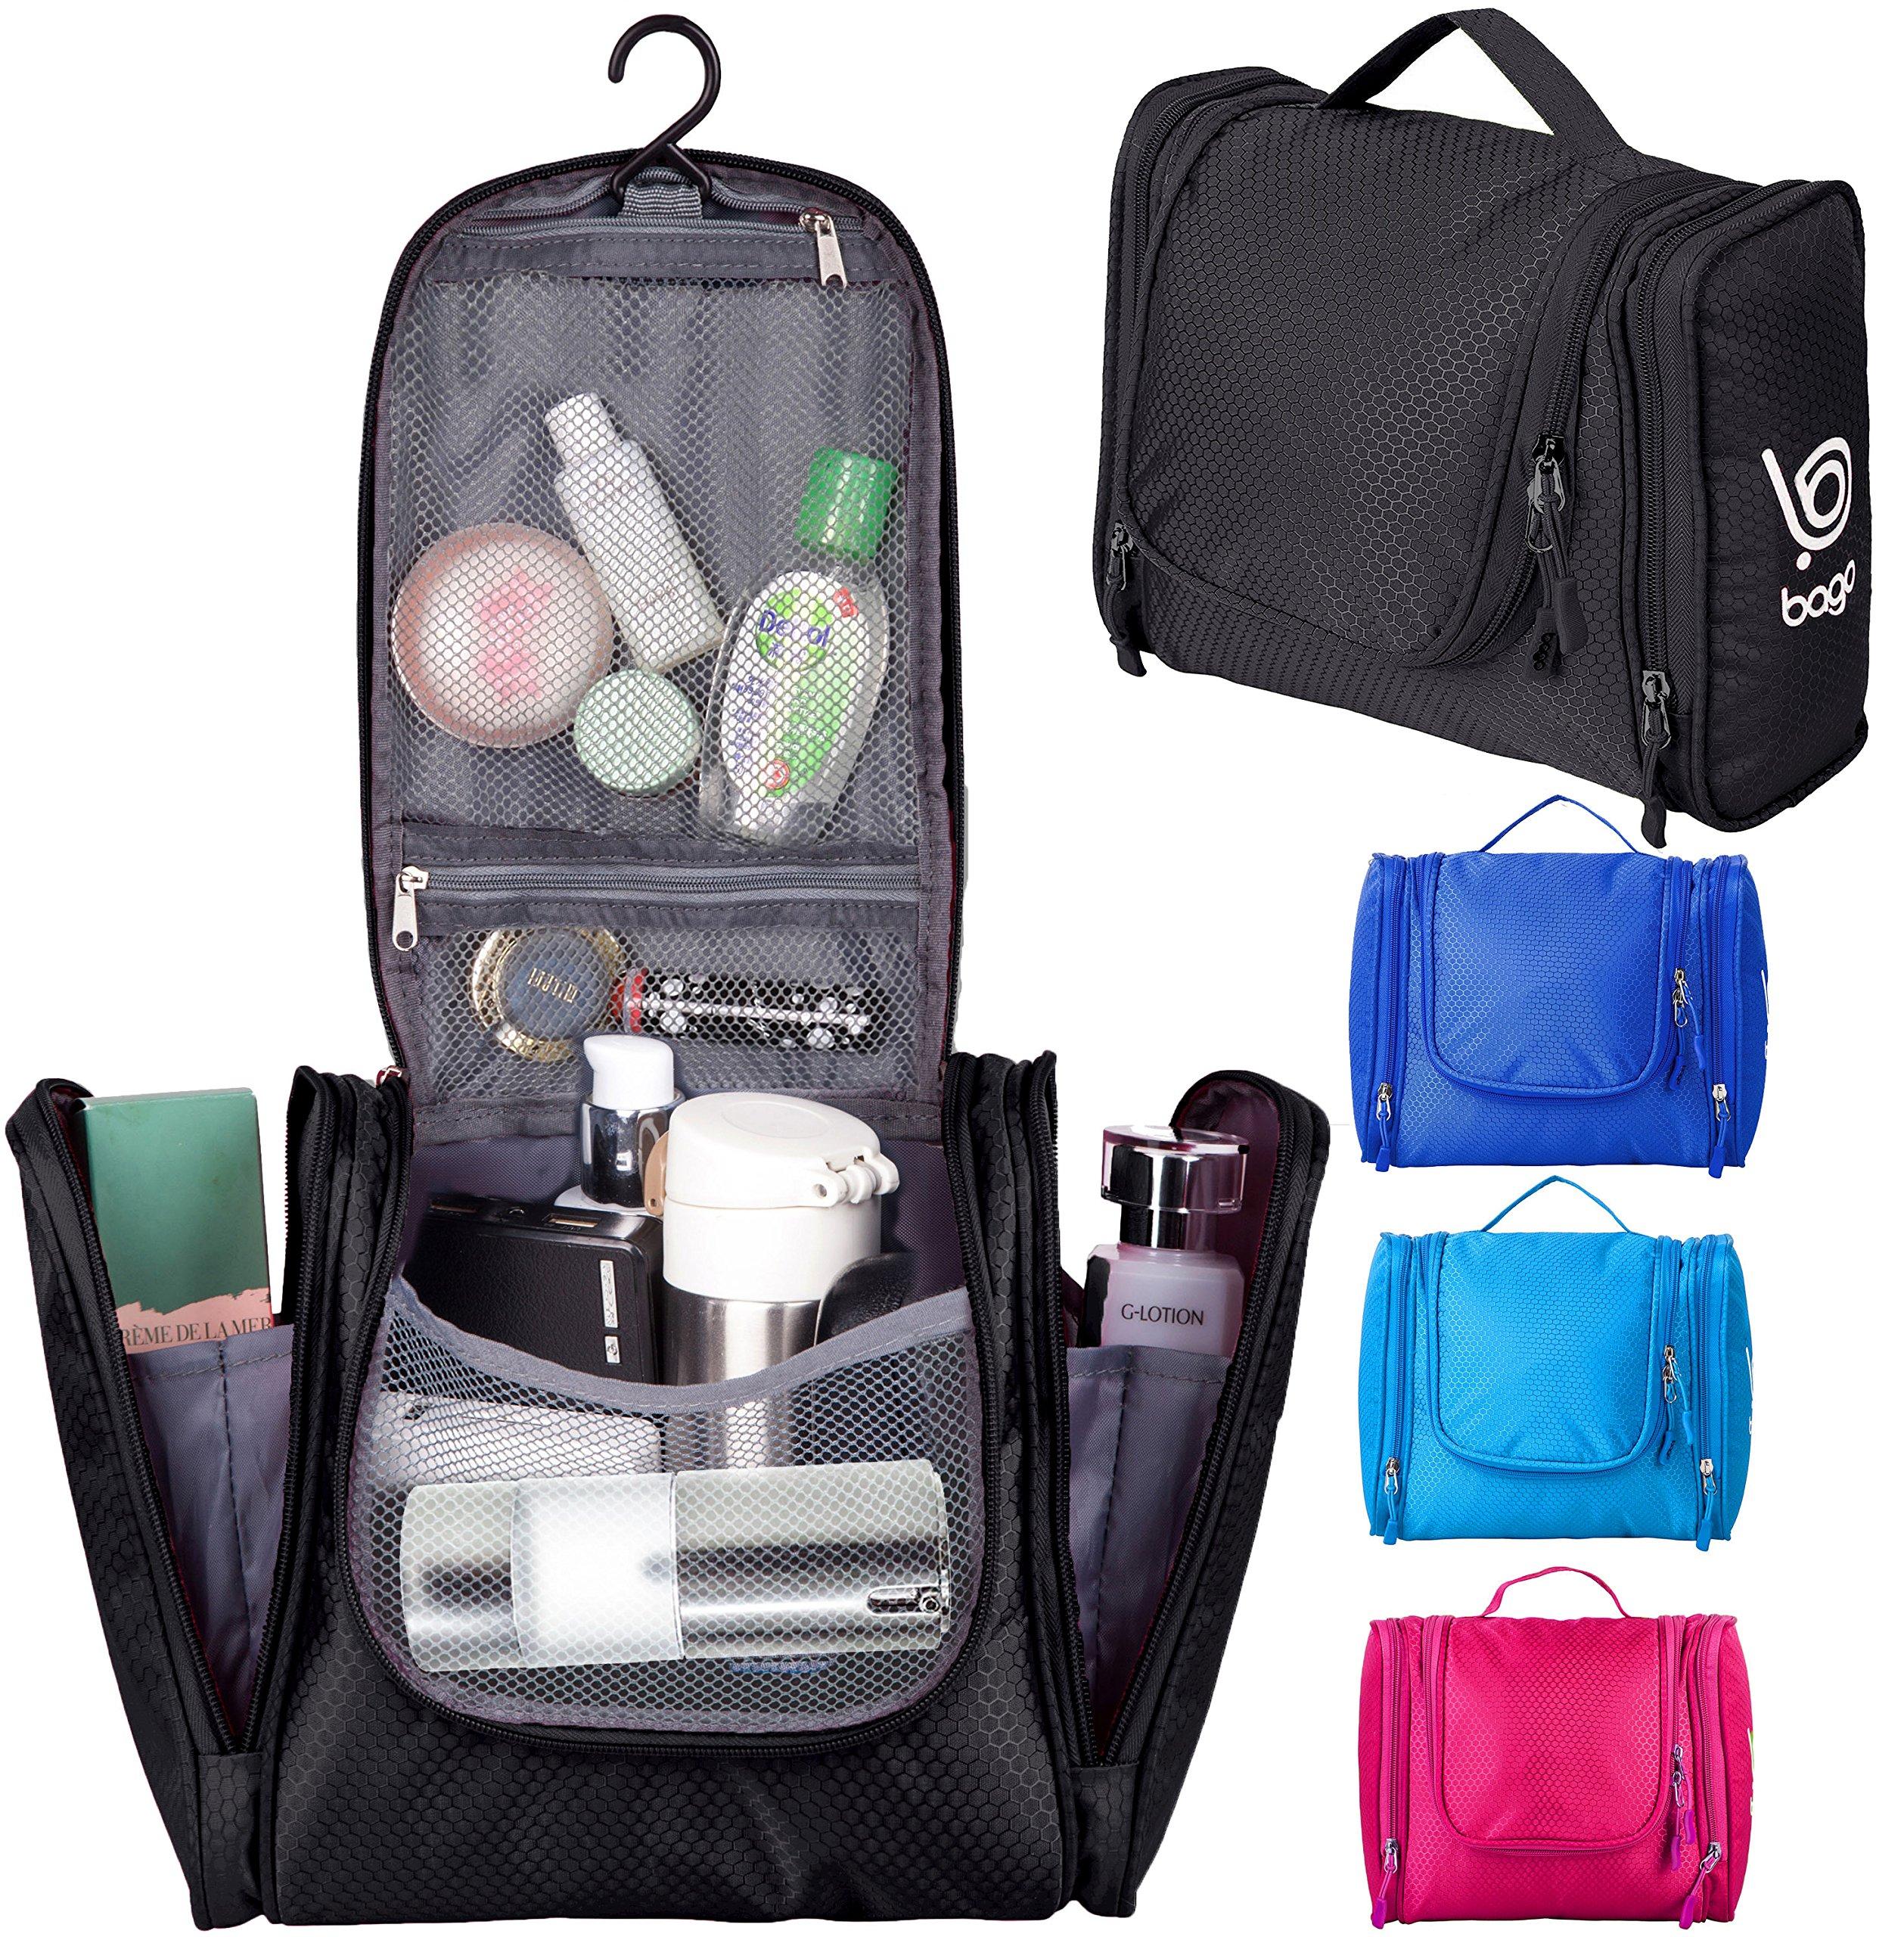 Bago Hanging Toiletry Bag For Men & Women - Toiletries Travel Organizer (Black)